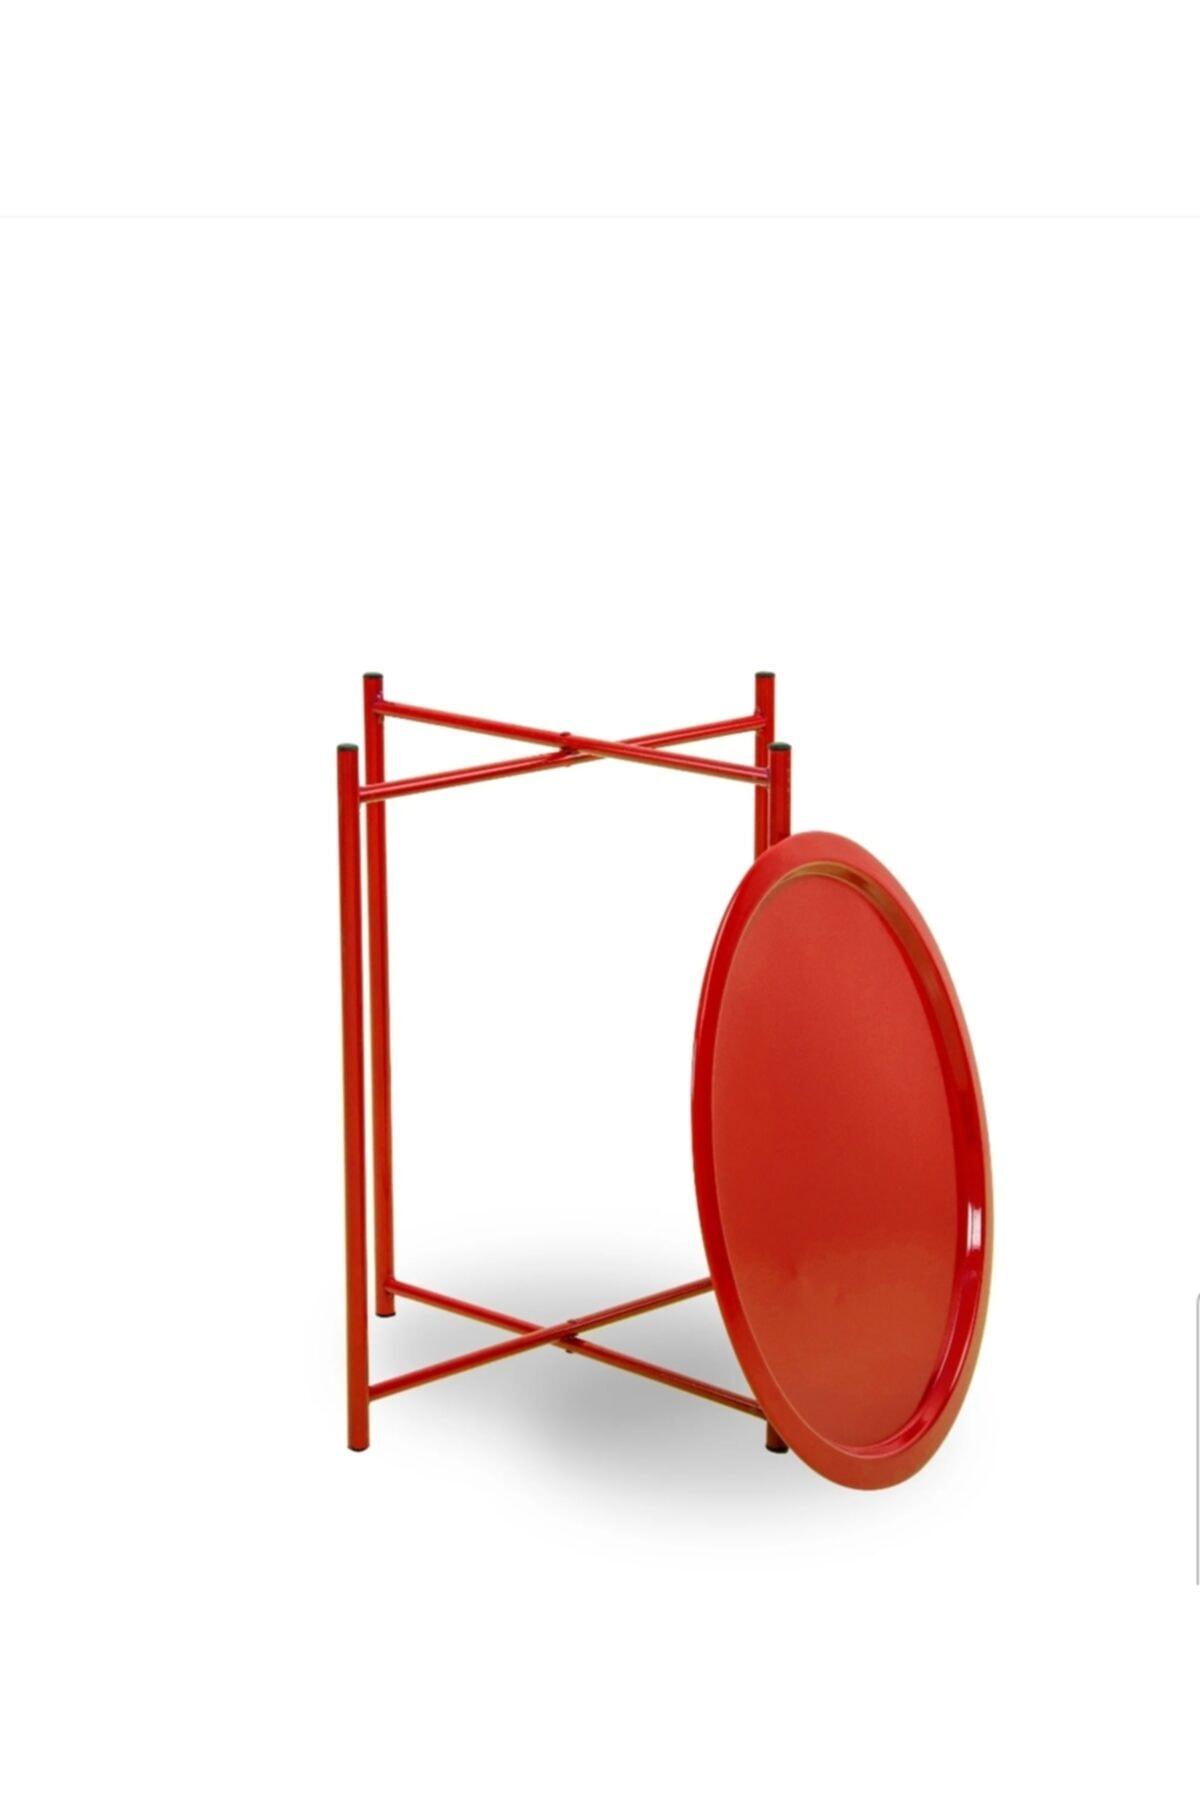 HASTUNÇ Kırmızı Hungold Katlanır Metal Sehpa 2